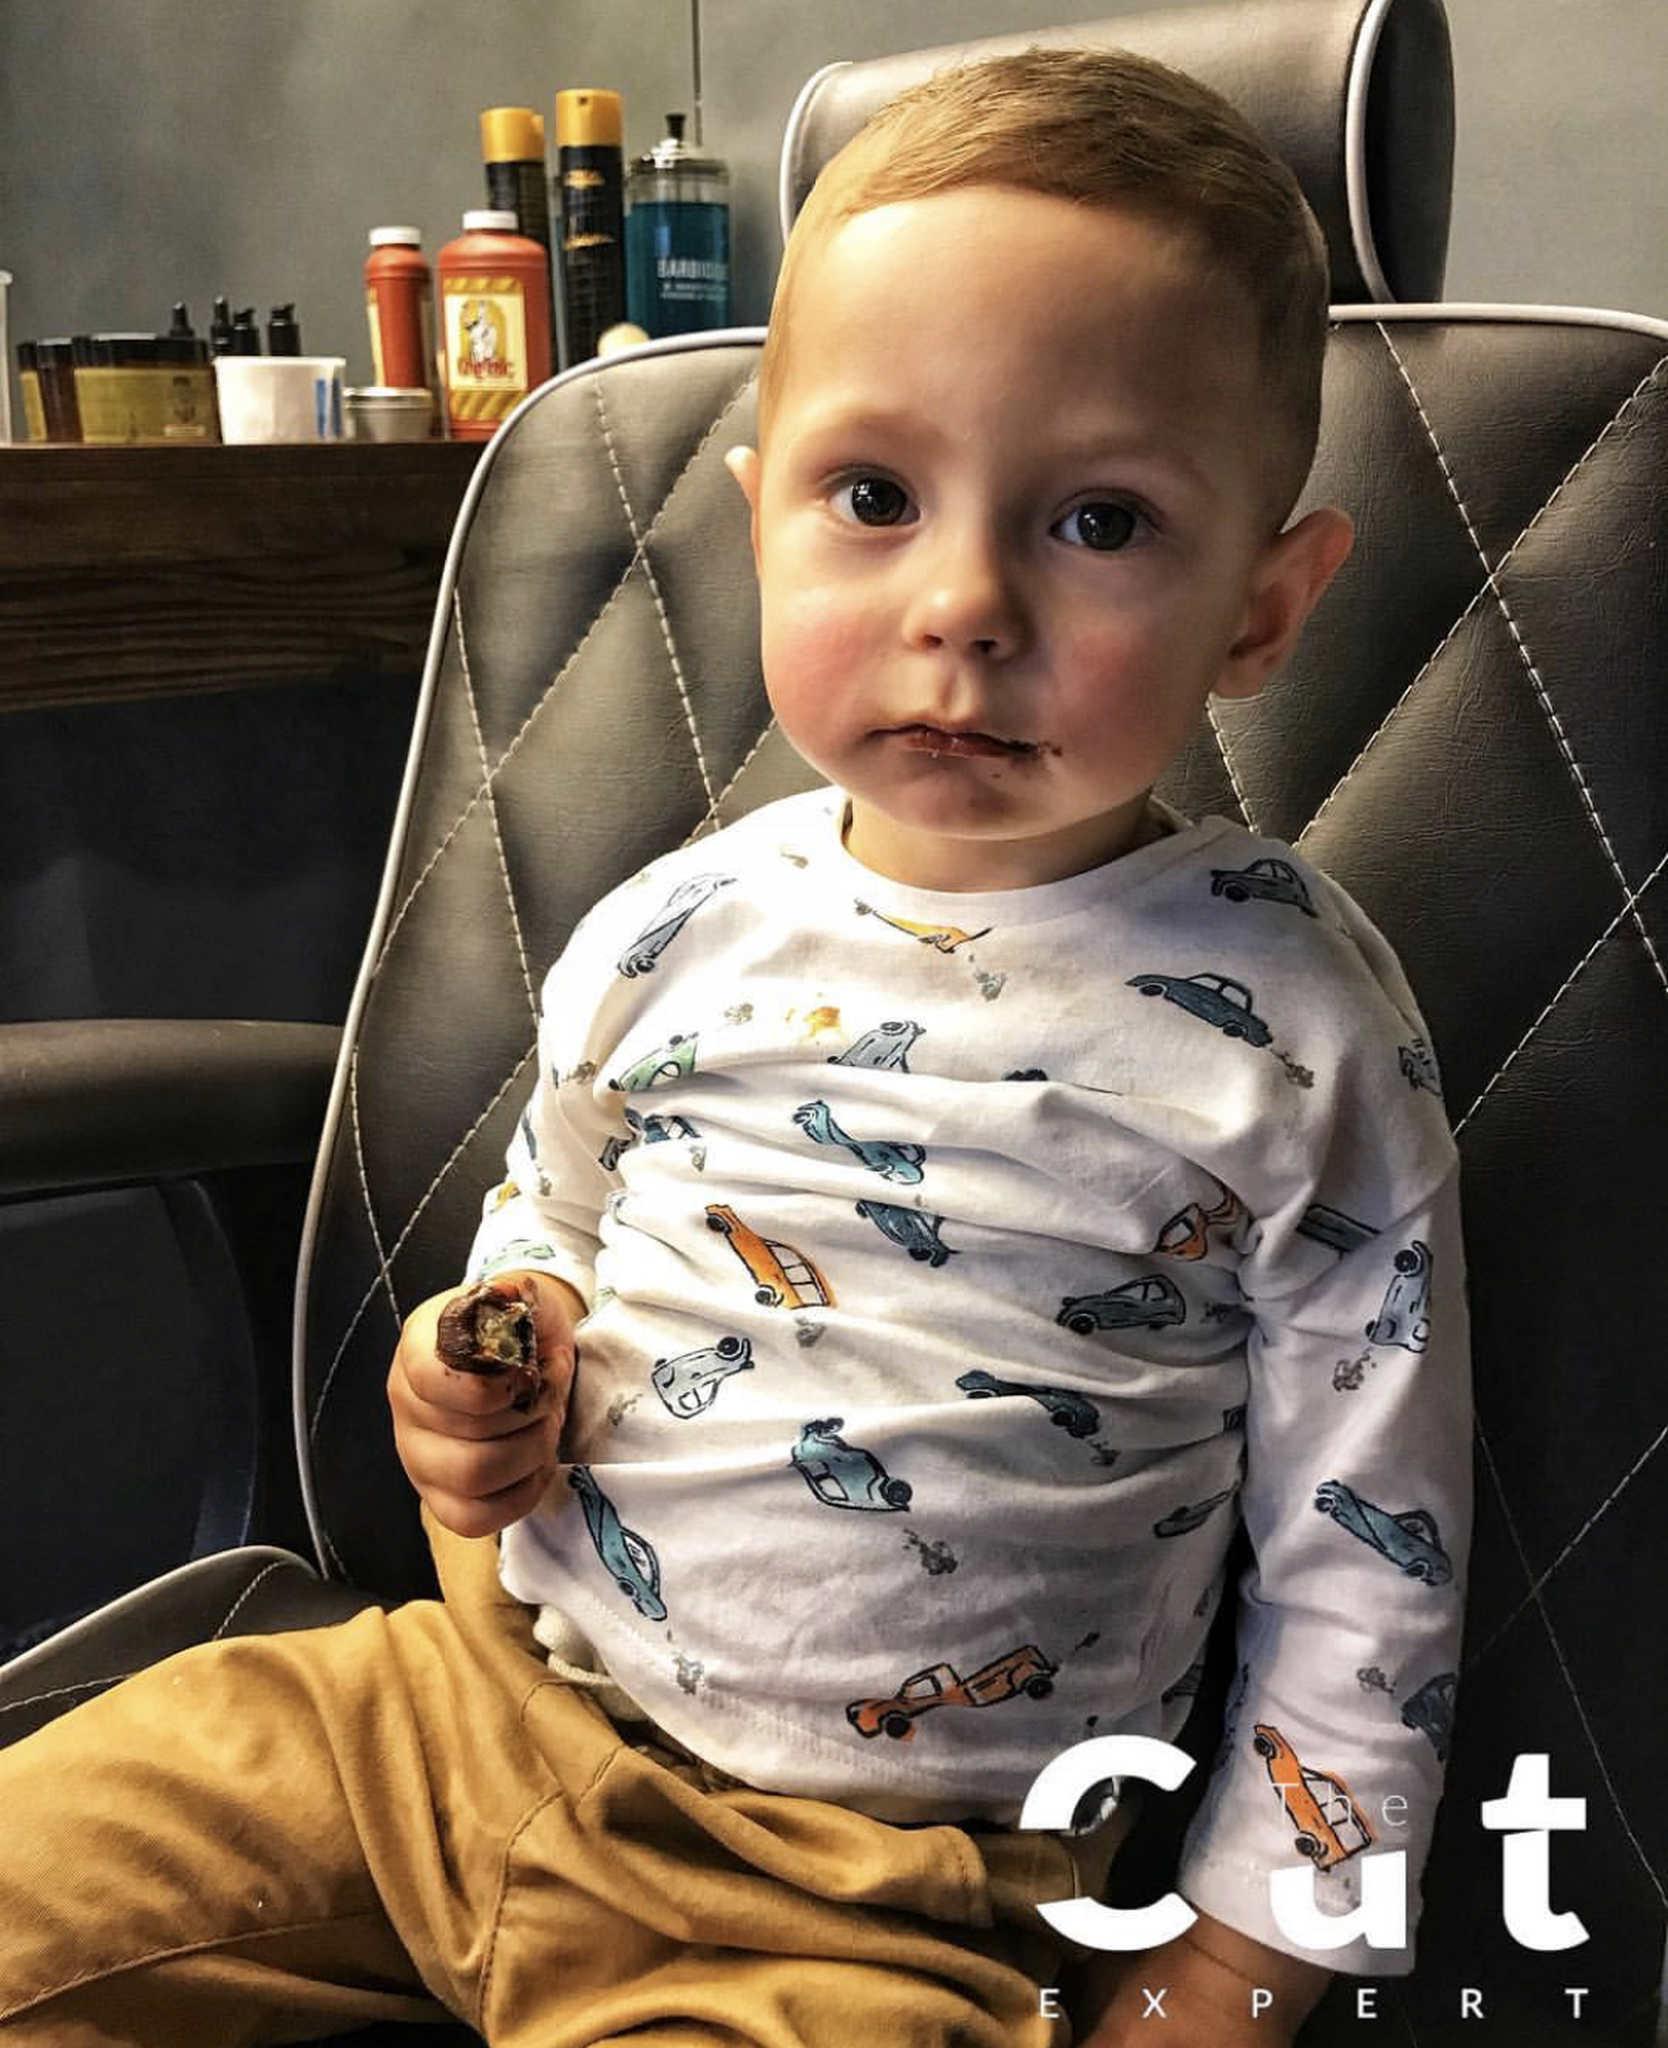 Dziecko u (nie) barbera